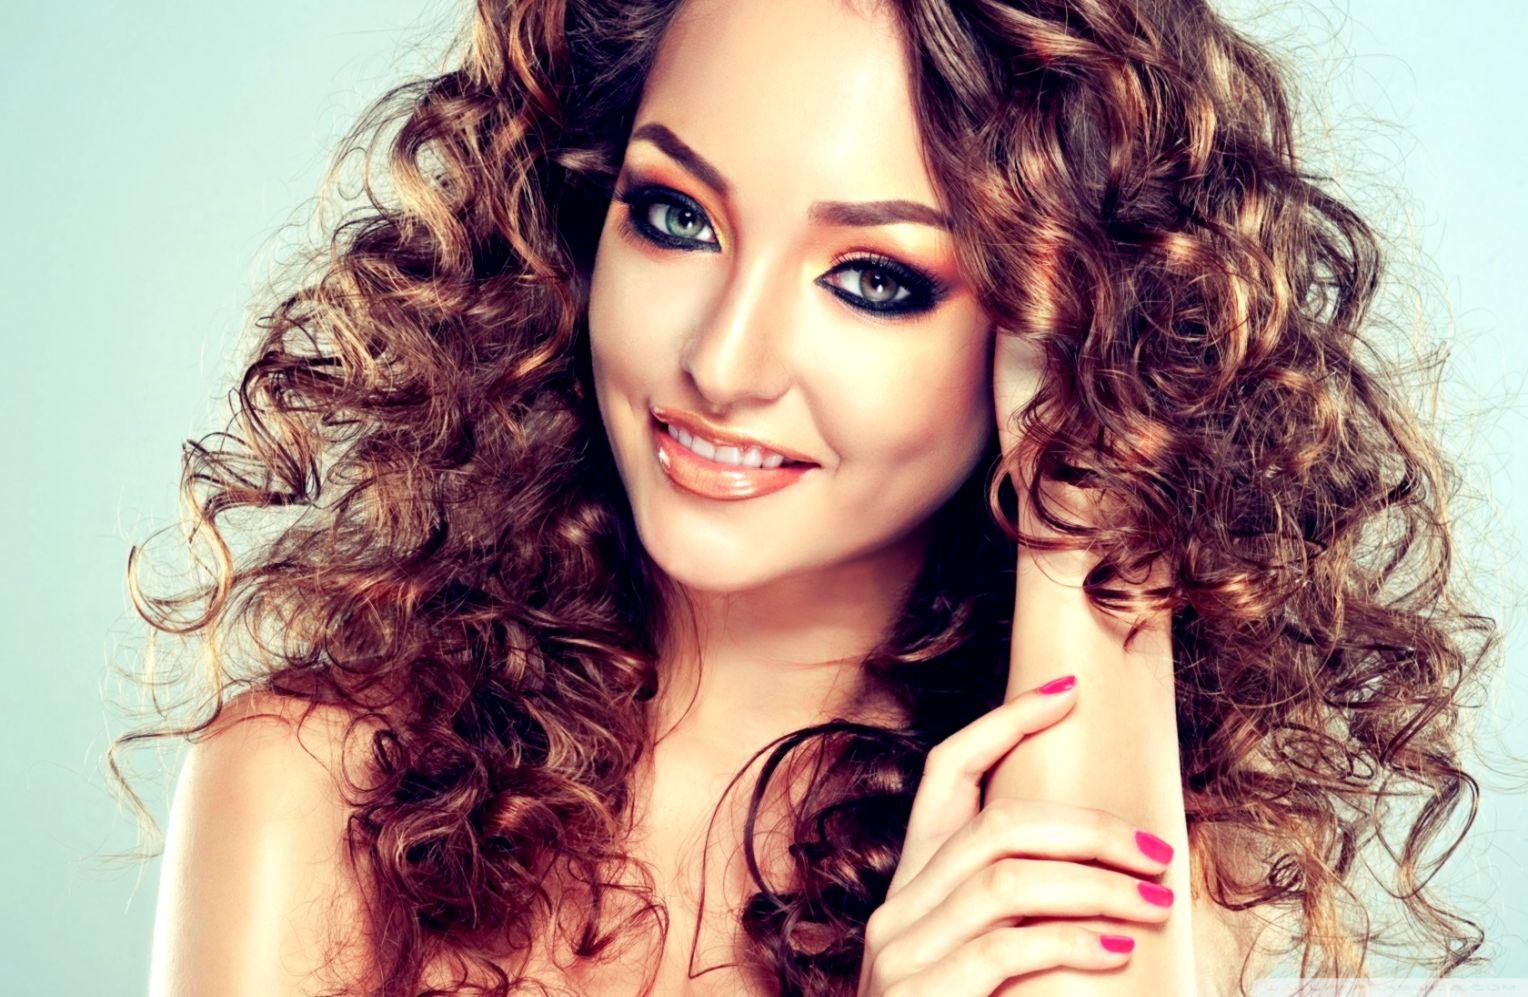 Beautiful Girl Makeup Hd Wallpaper The Great Wallpapers